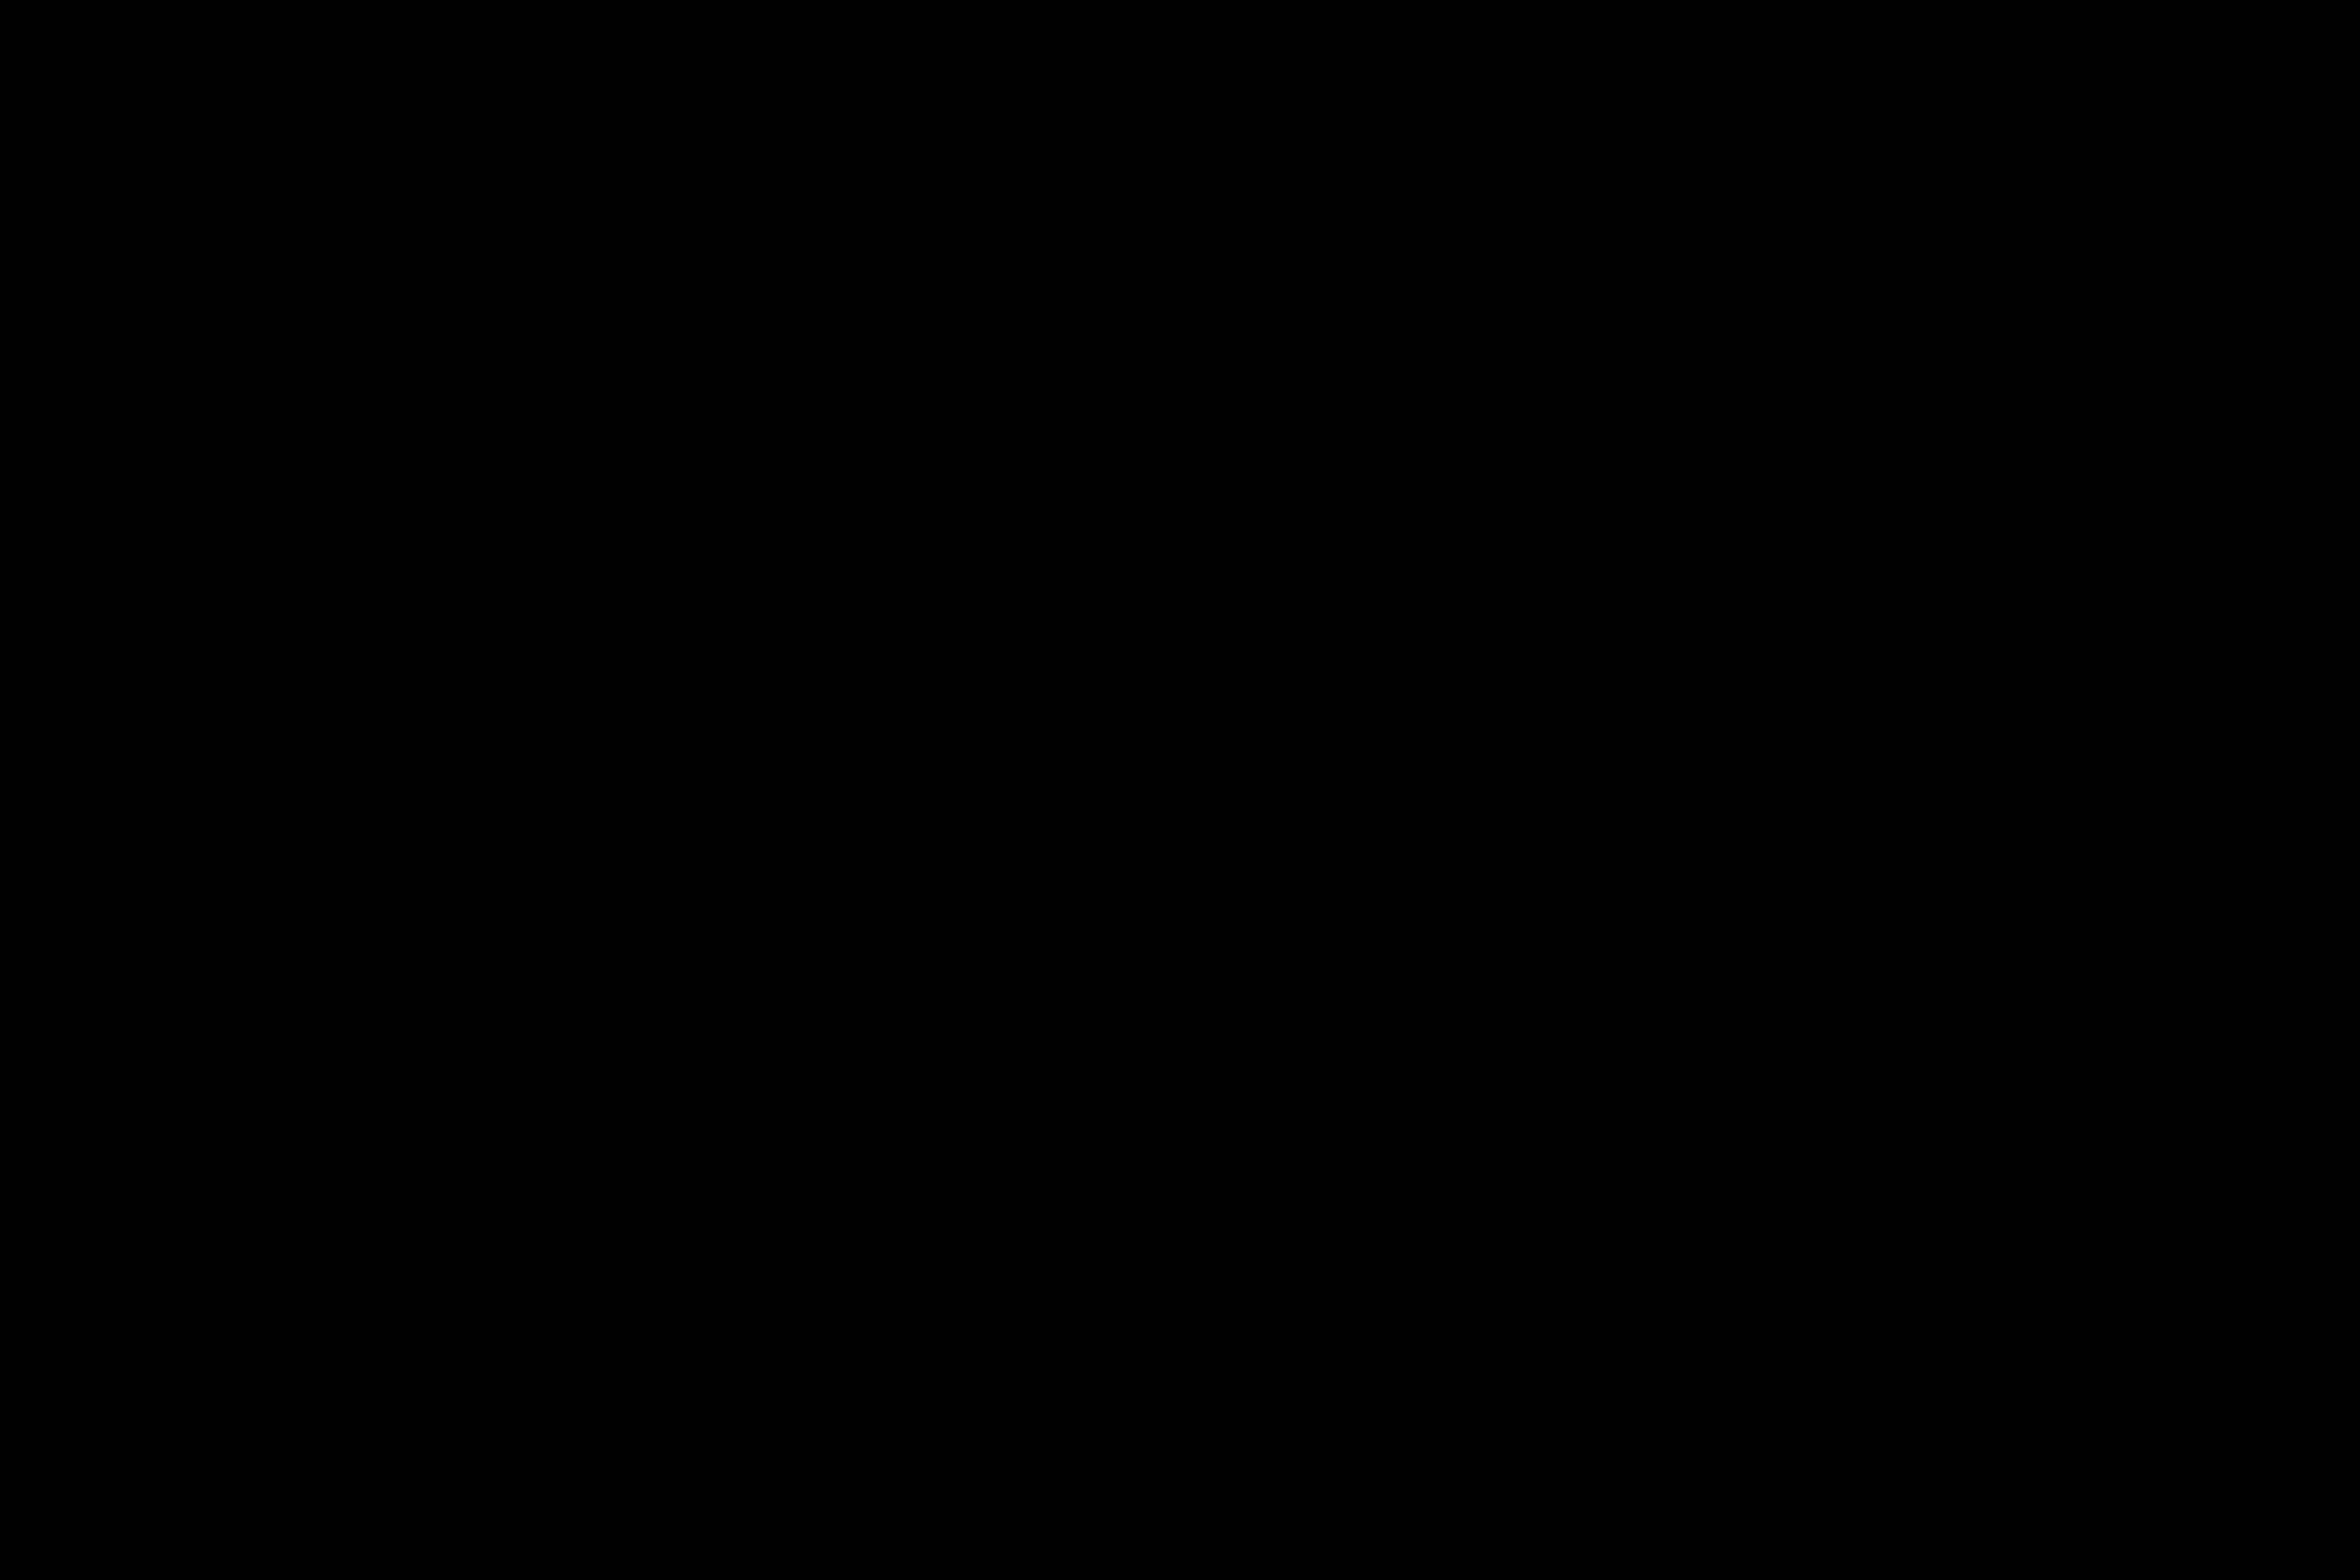 WALKO-Wandbeugelset  (vanaf september weer leverbaar)